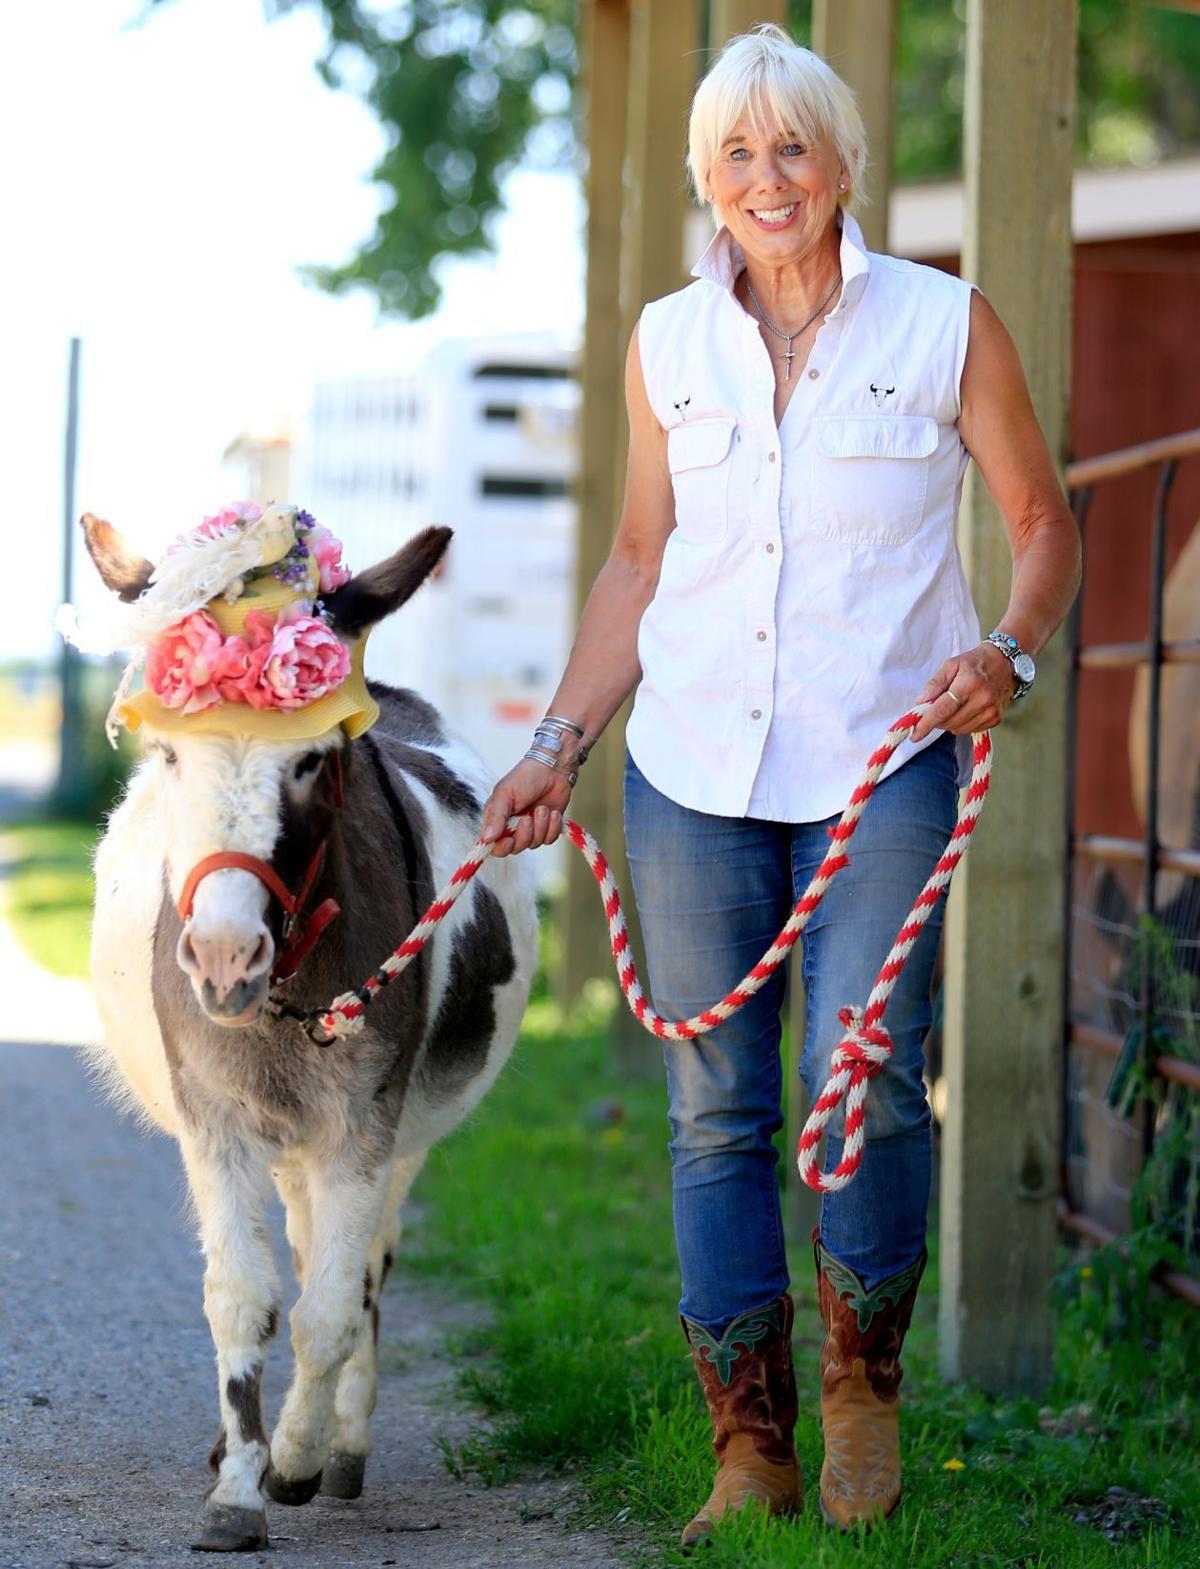 Jonnie Jonckowski and Blossom the donkey